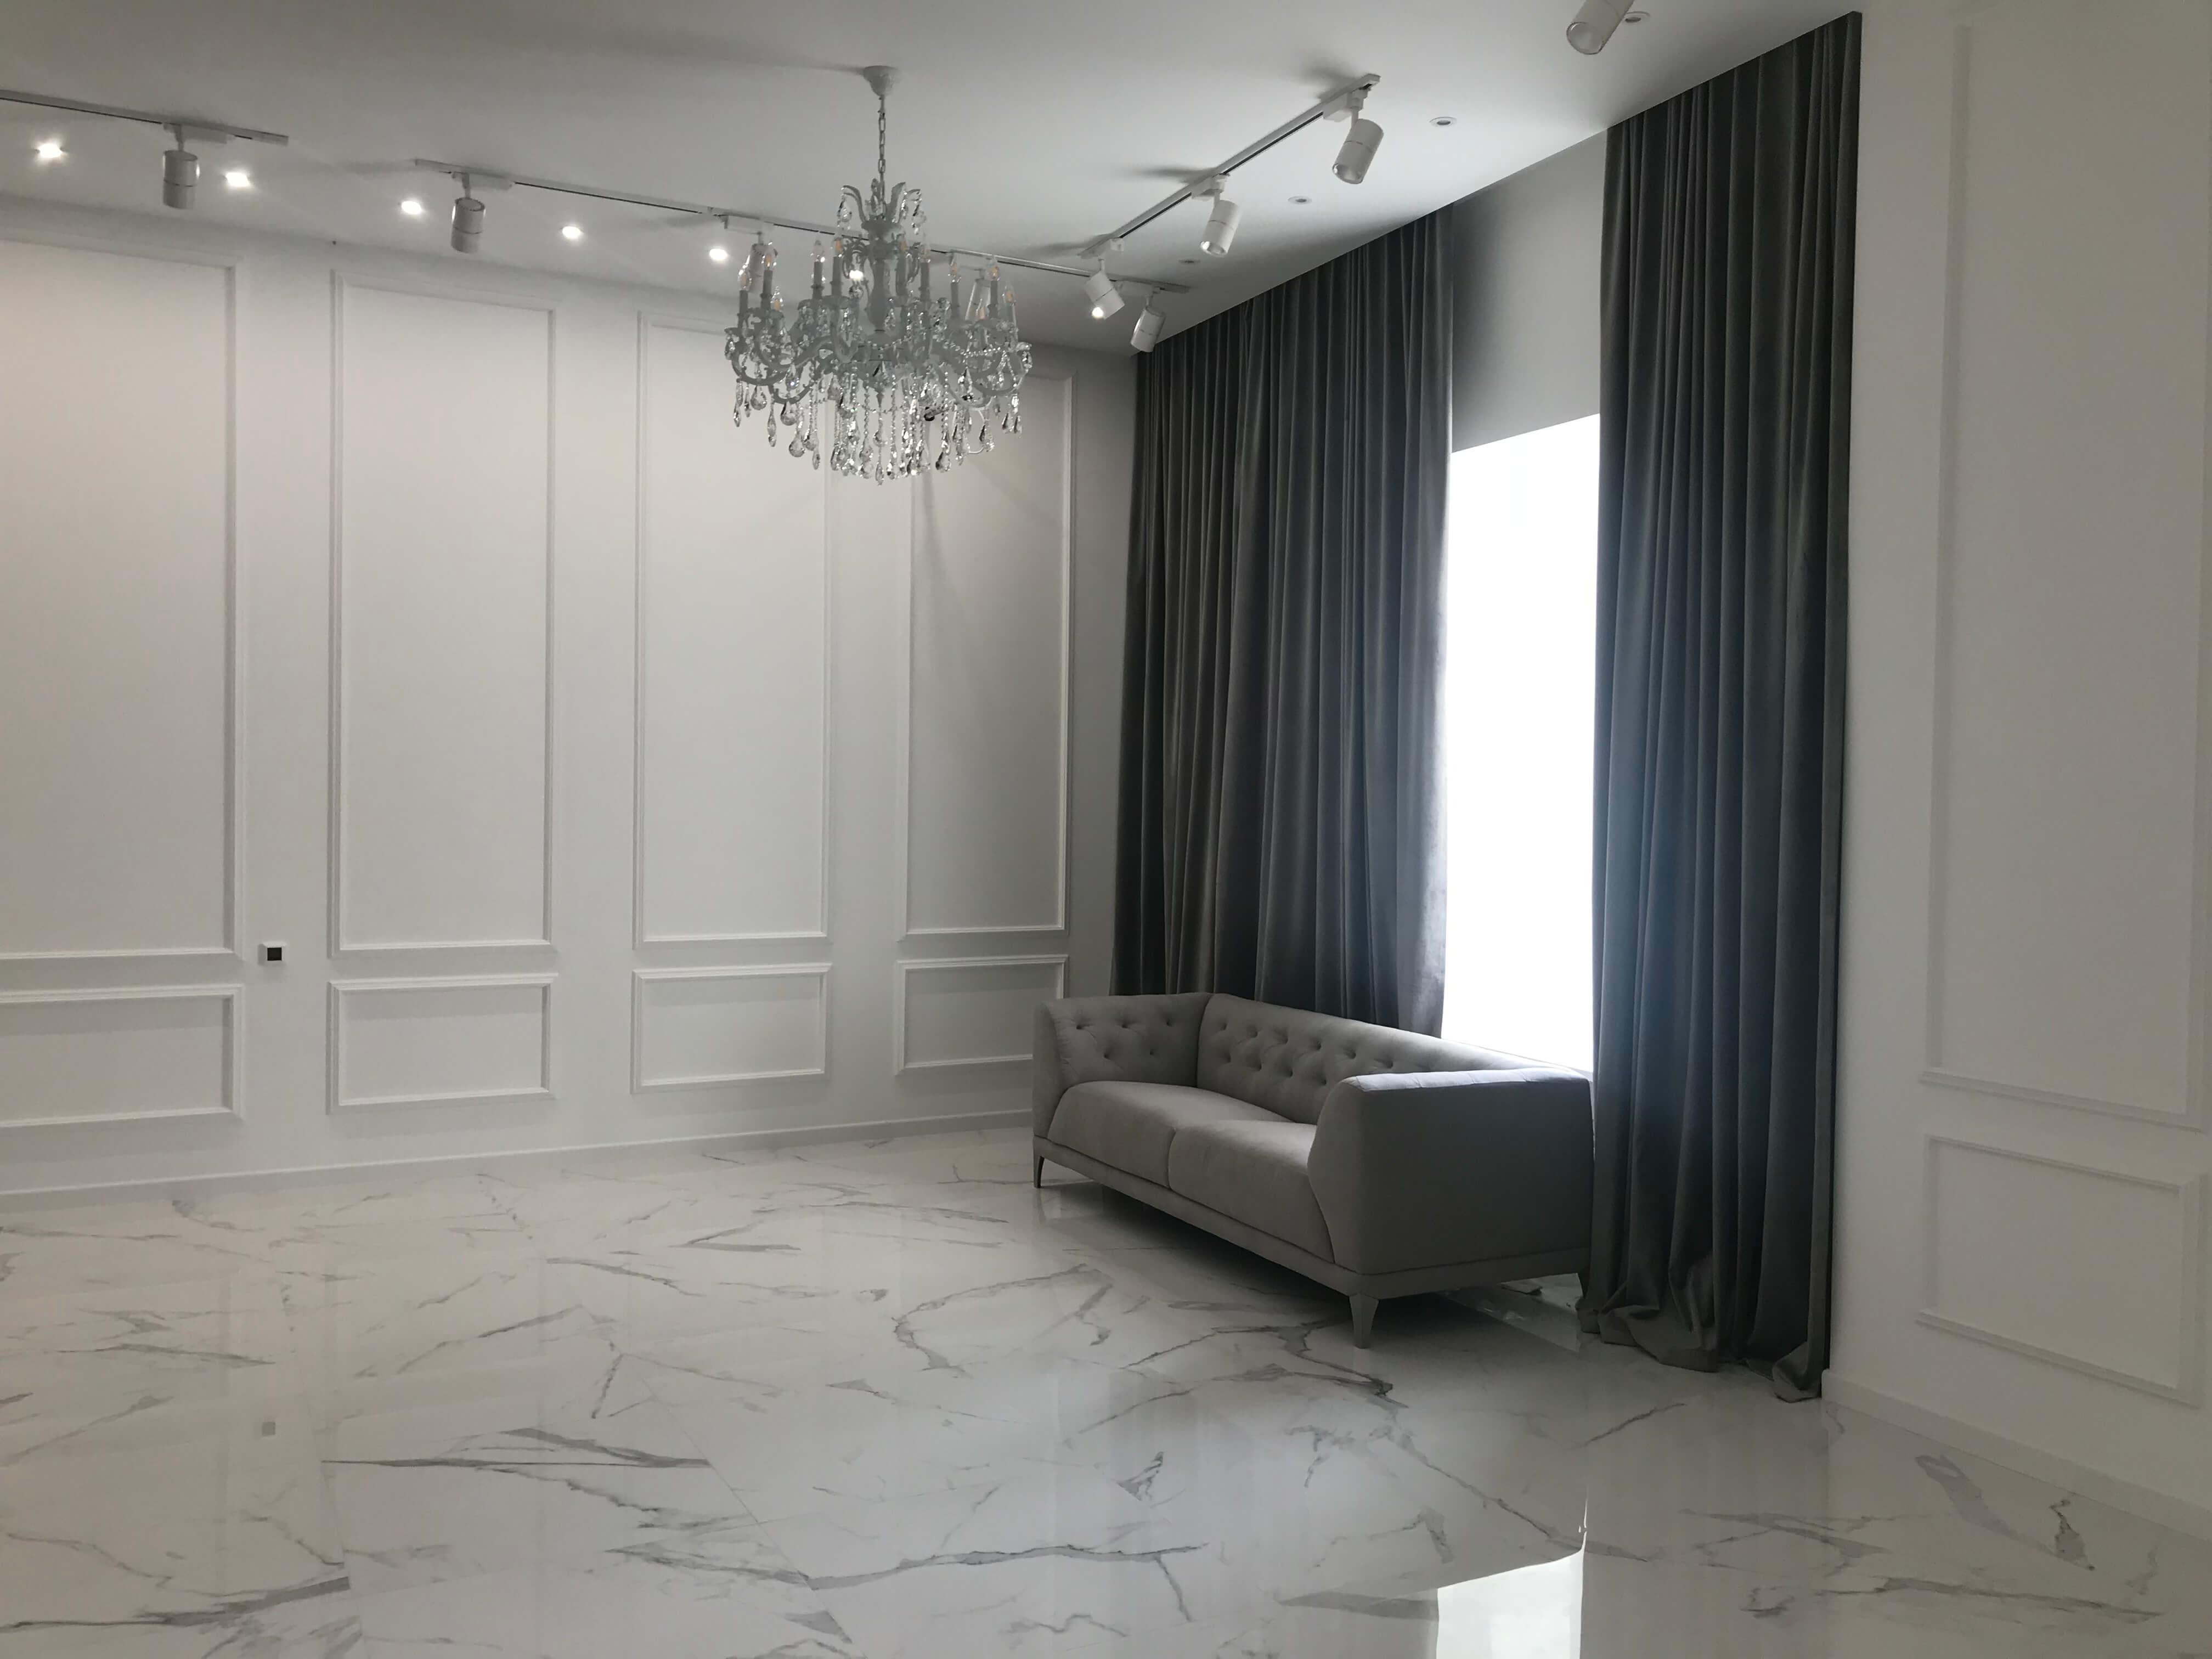 вид квартиры после ремонта, диван, окно и занавески